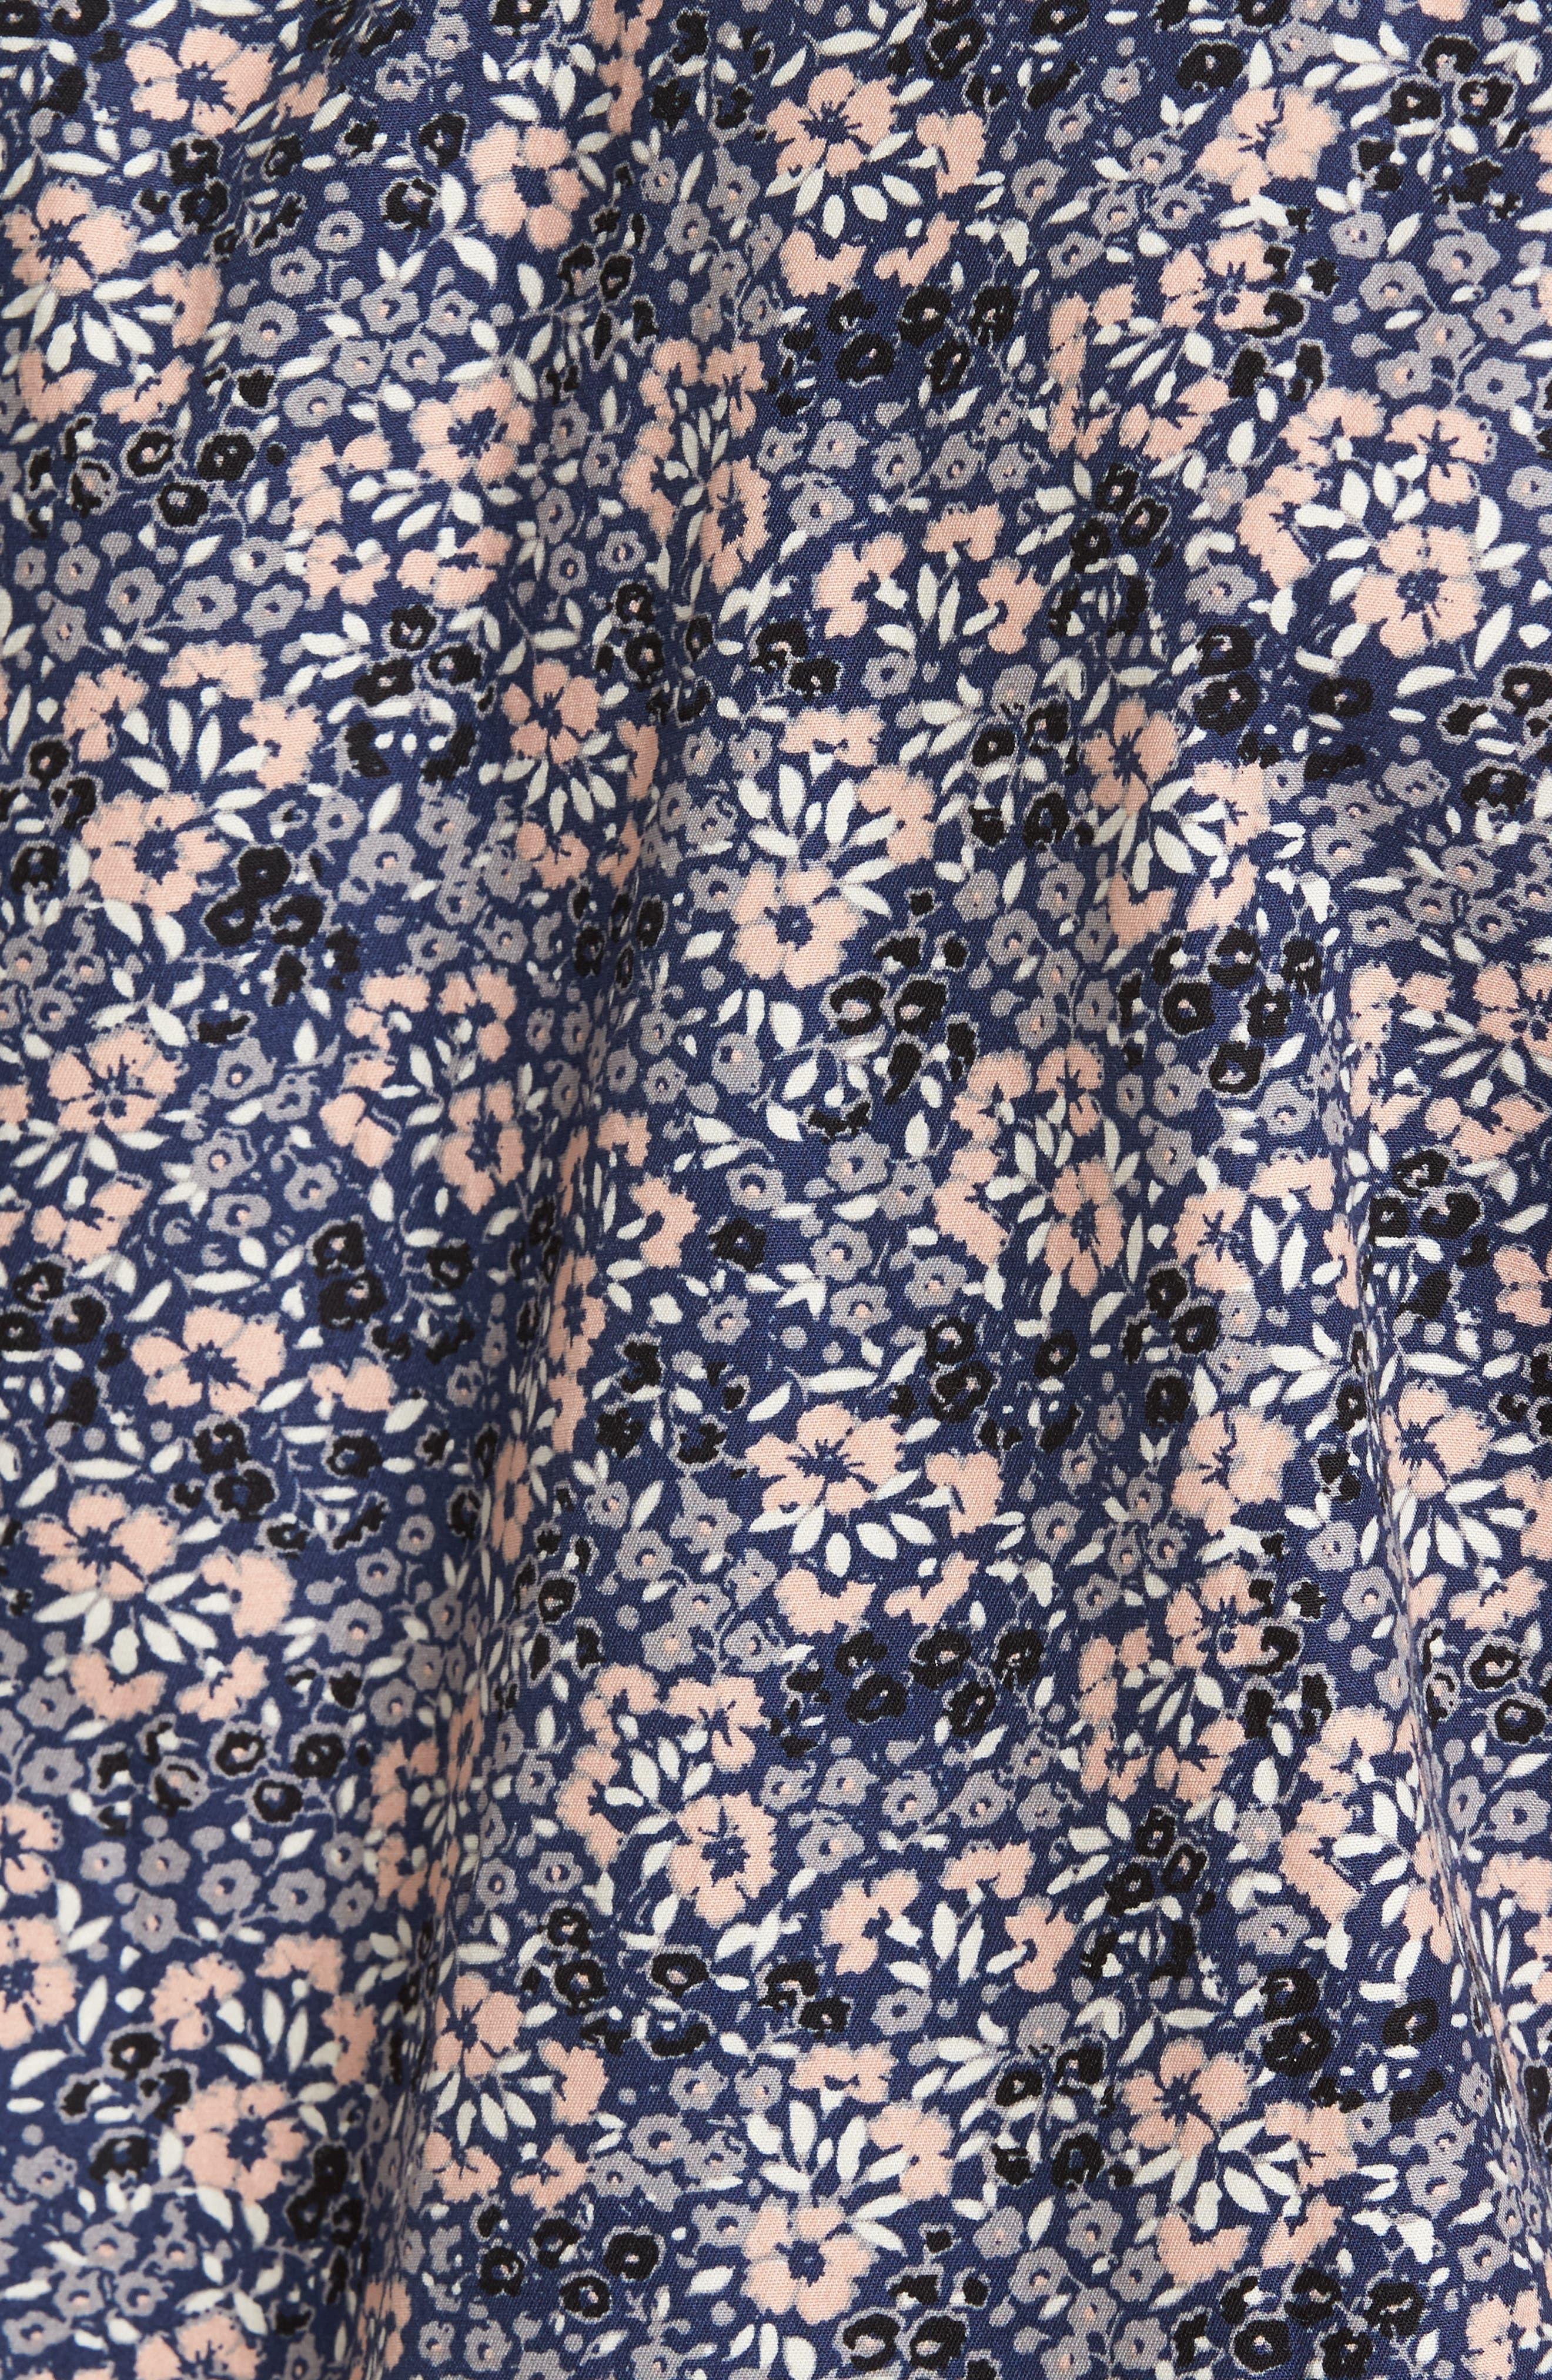 Poplin Floral Shirt,                             Alternate thumbnail 5, color,                             Navy Peacoat Simple Floral